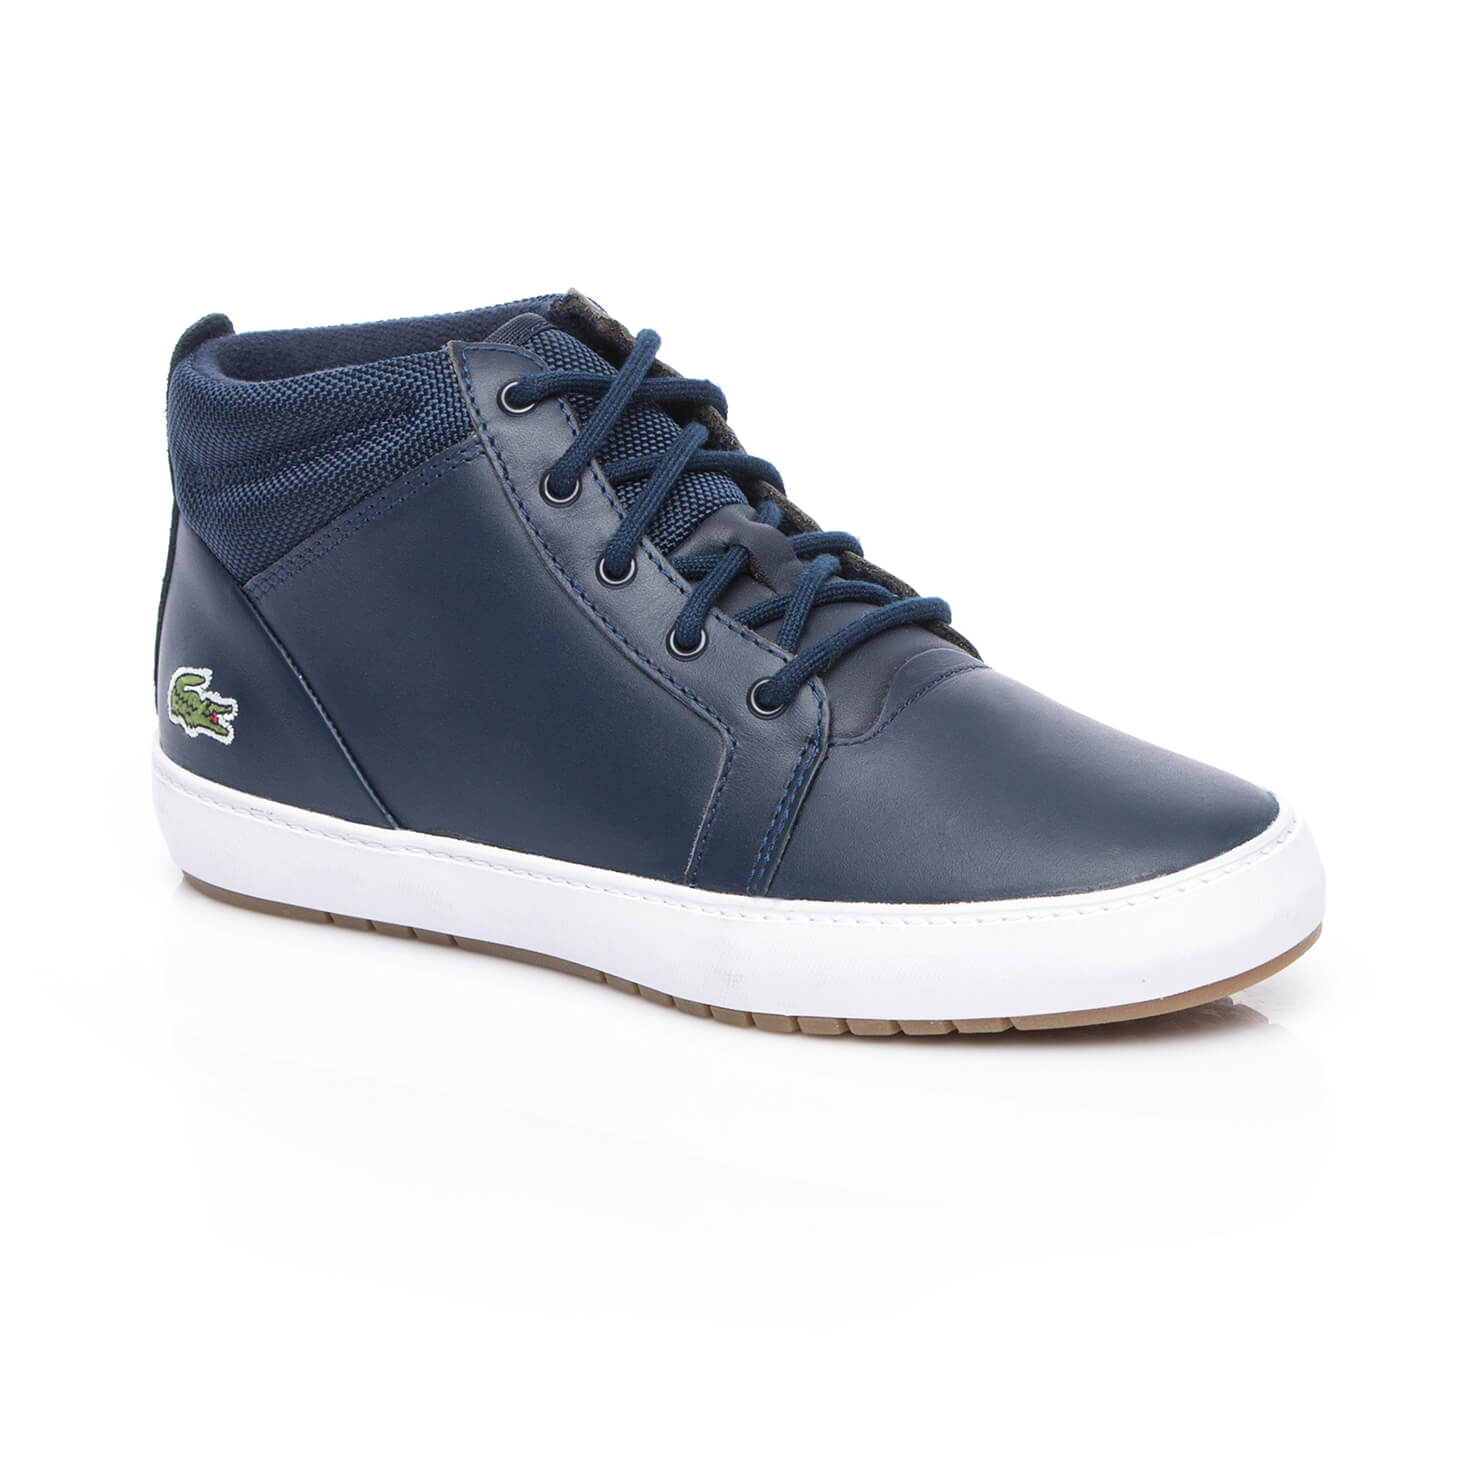 Lacoste Ampthill Chukka 316 1 Damskie Boots